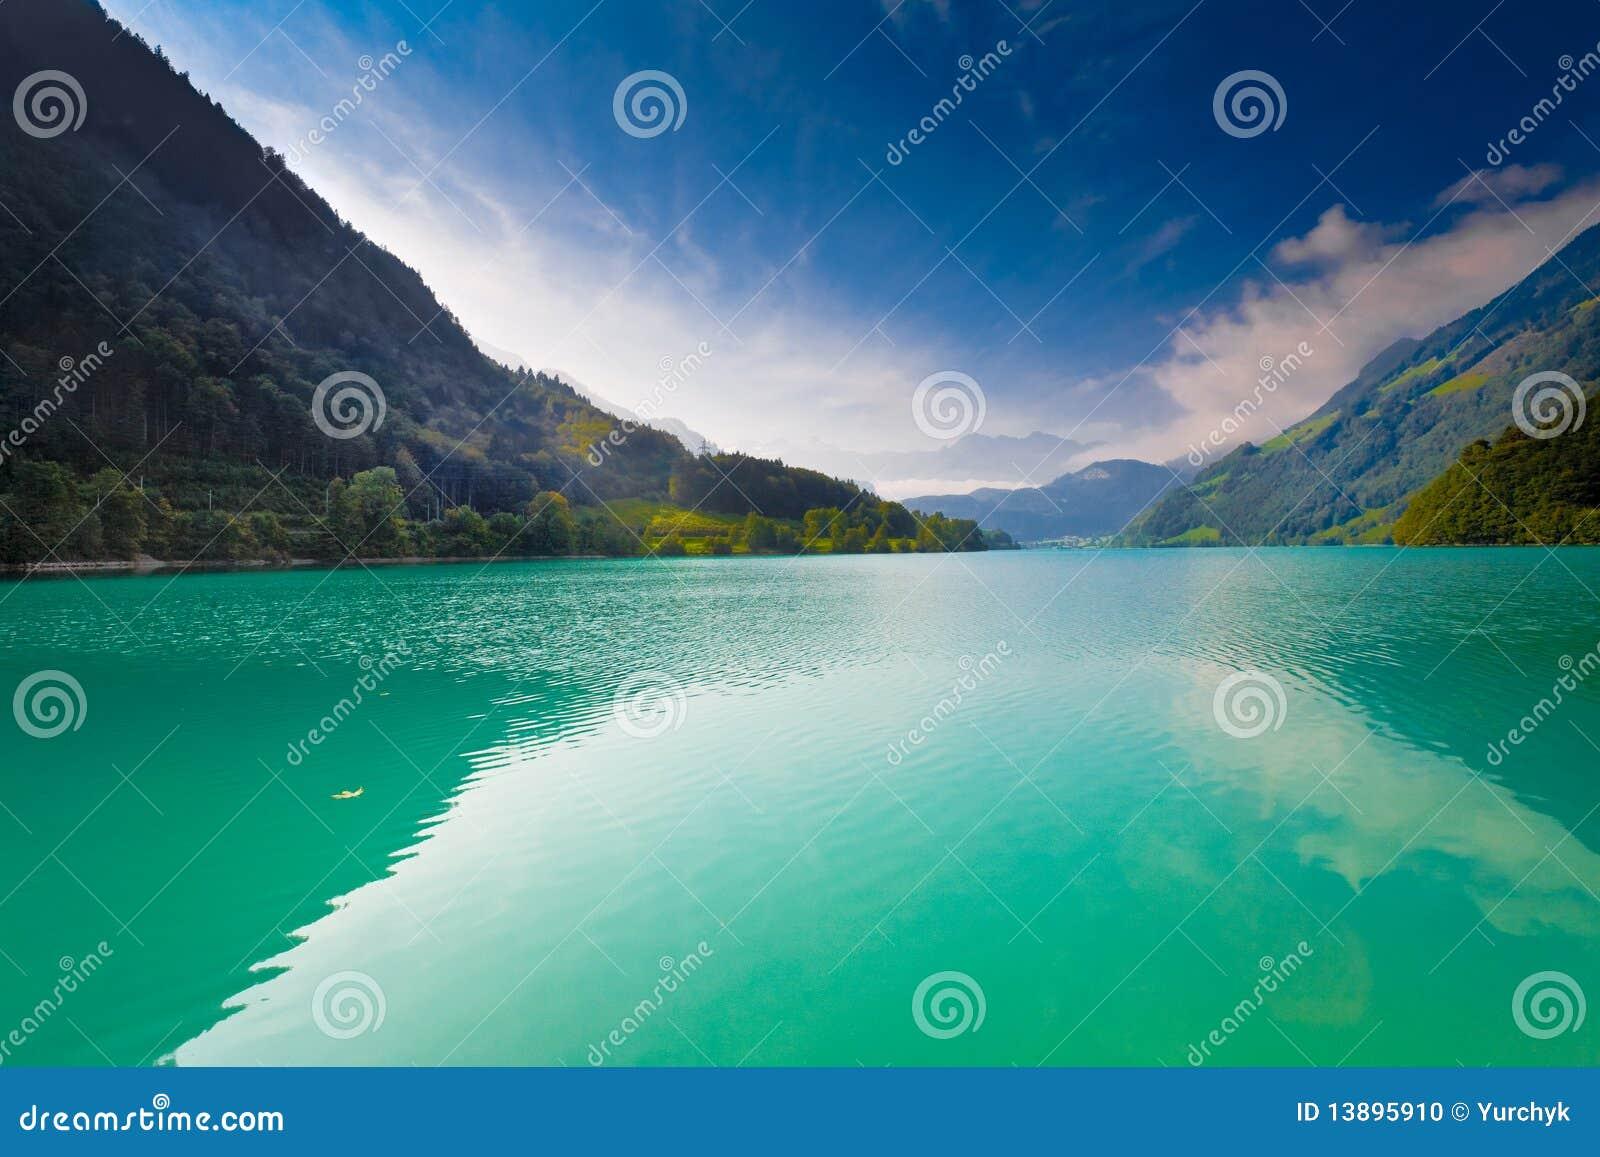 Majestic mountain lake in Switzerland